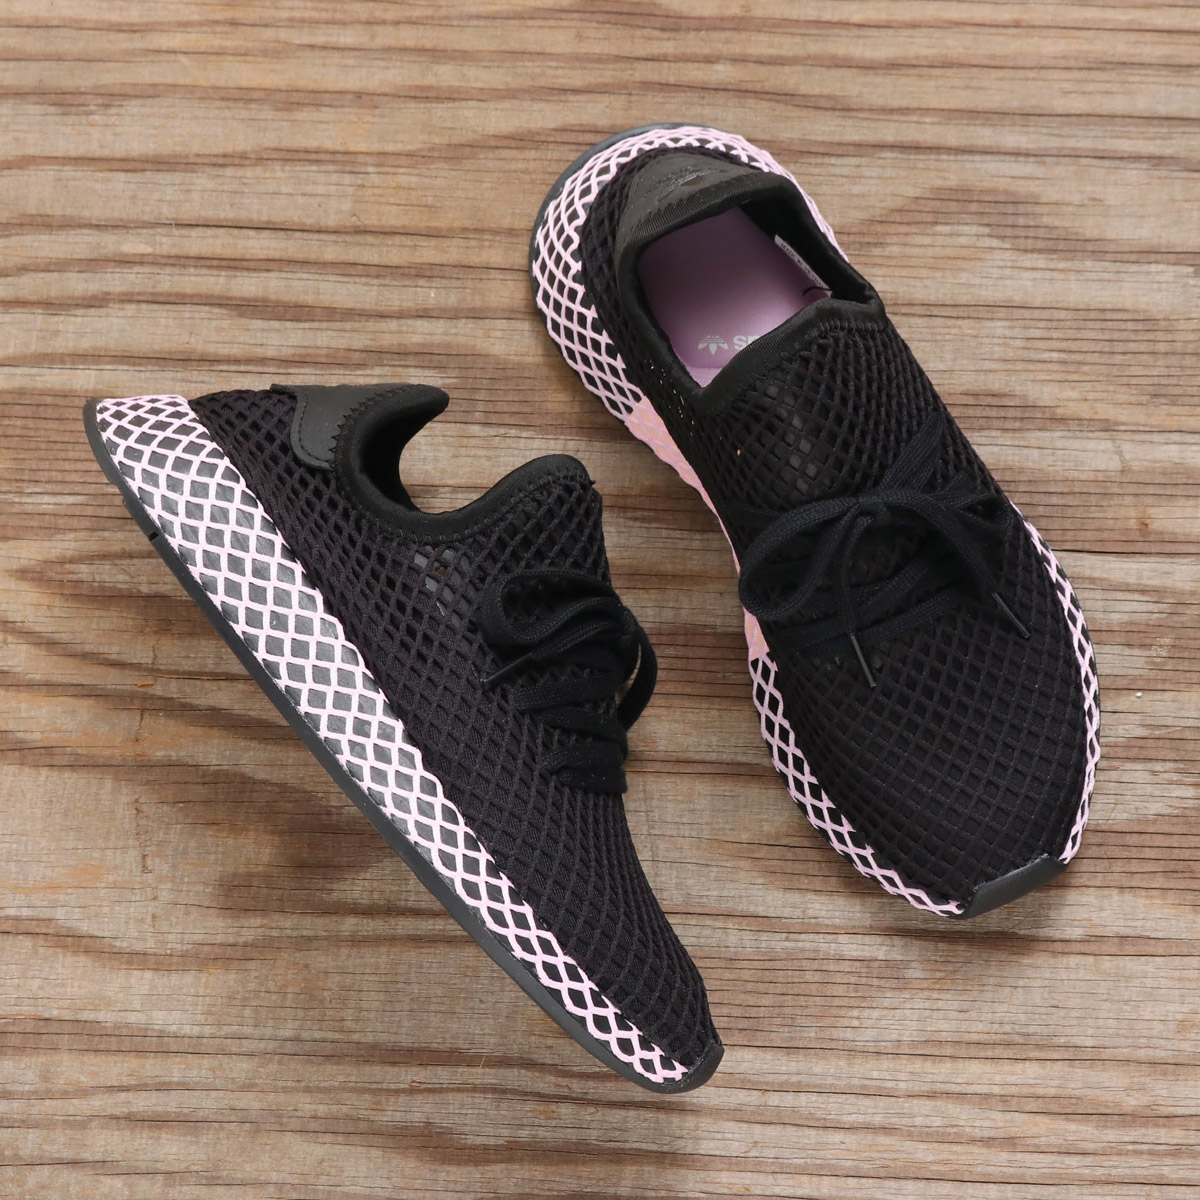 9fd581d4b adidas Originals DEERUPT RUNNER W (アディダスオリジナルスディーラプトランナー W) CORE BLACK CORE  BLACK CLEAR LILAC 18FA-I